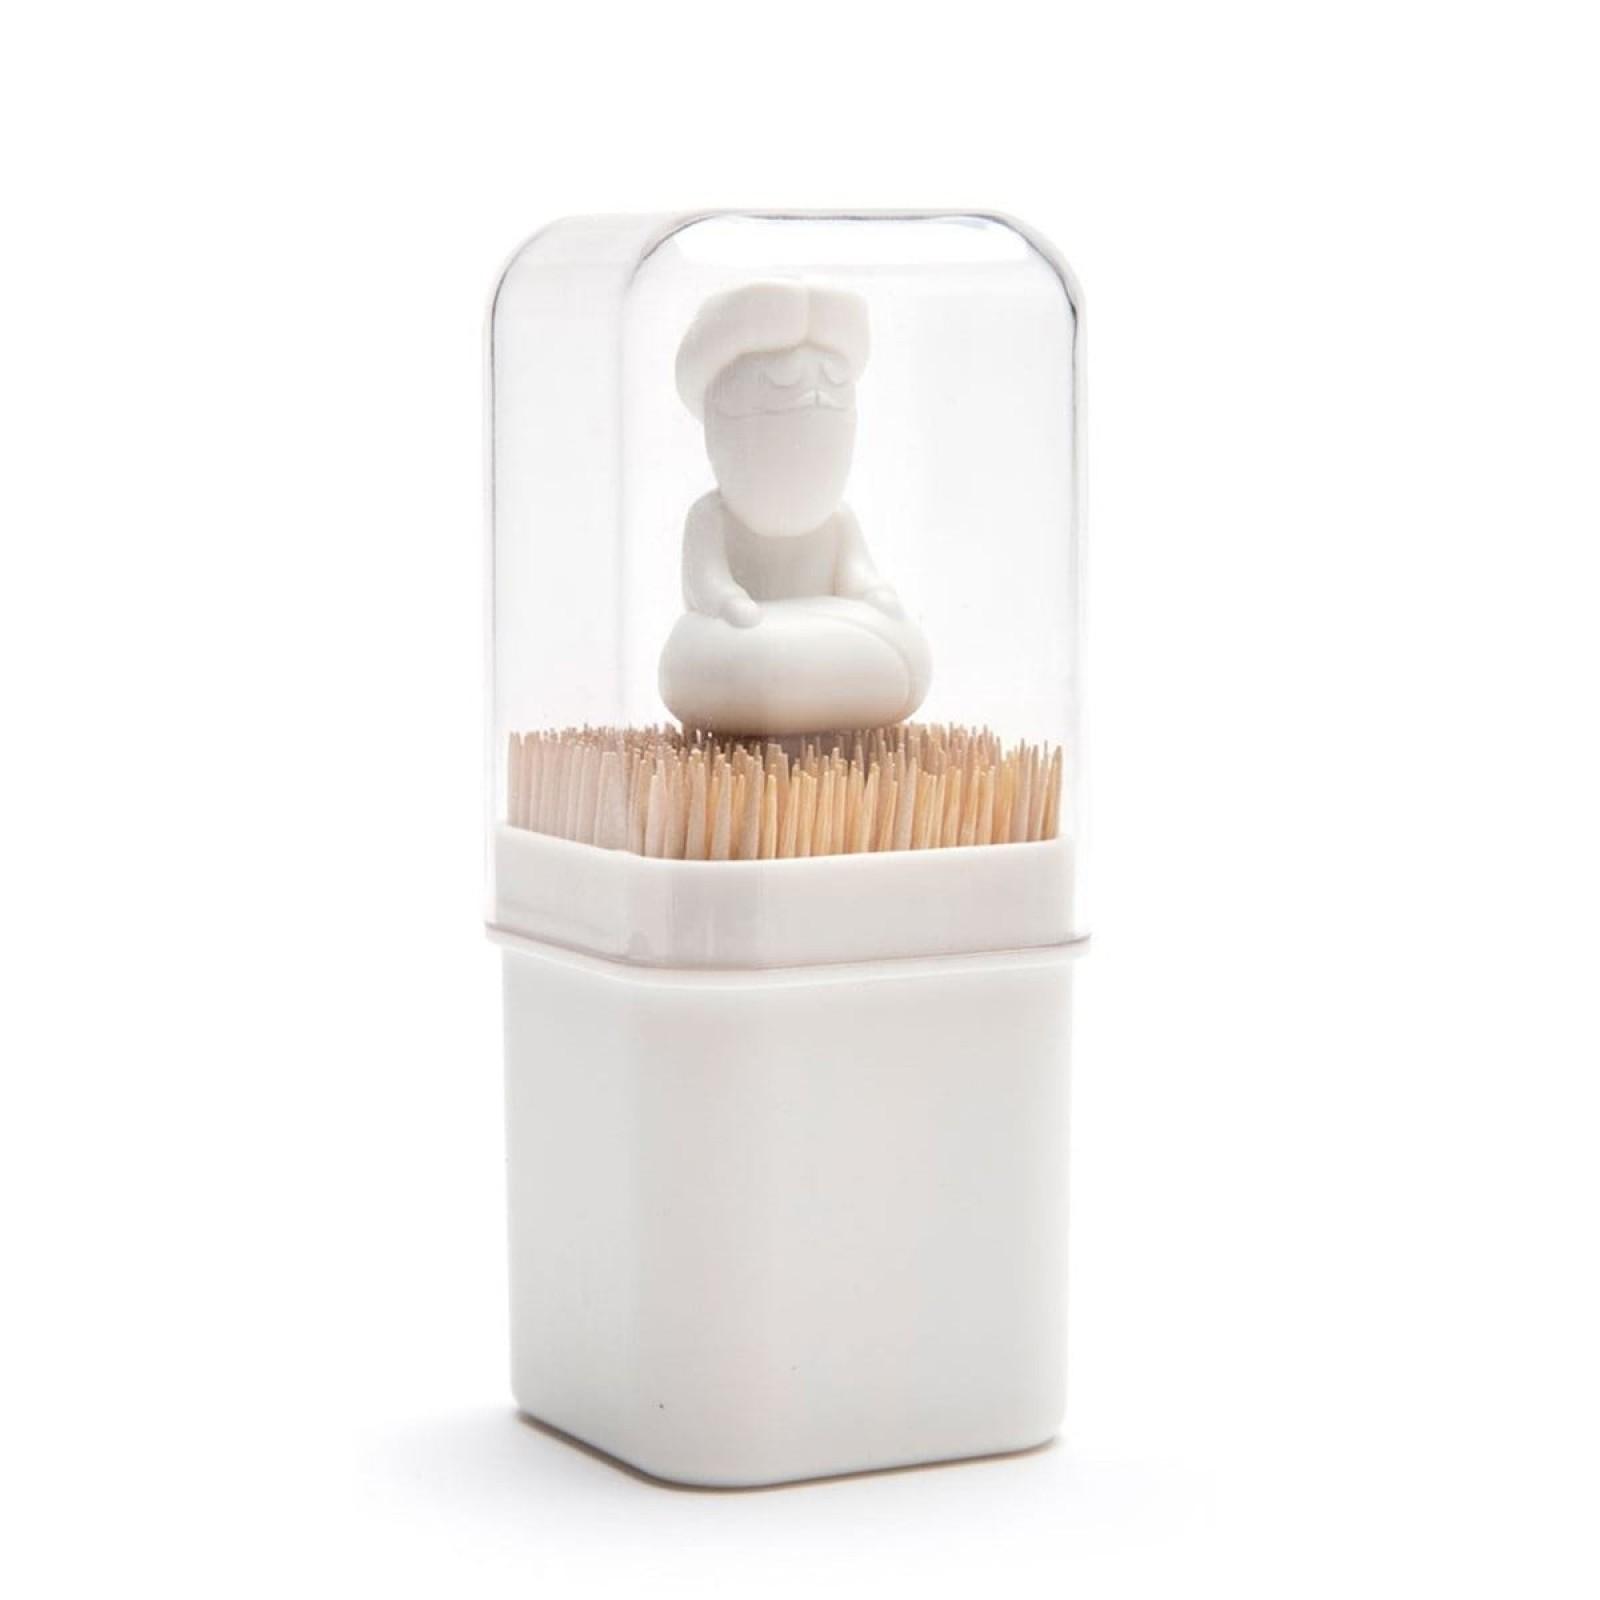 Babu Toothpick Holder - Peleg Design